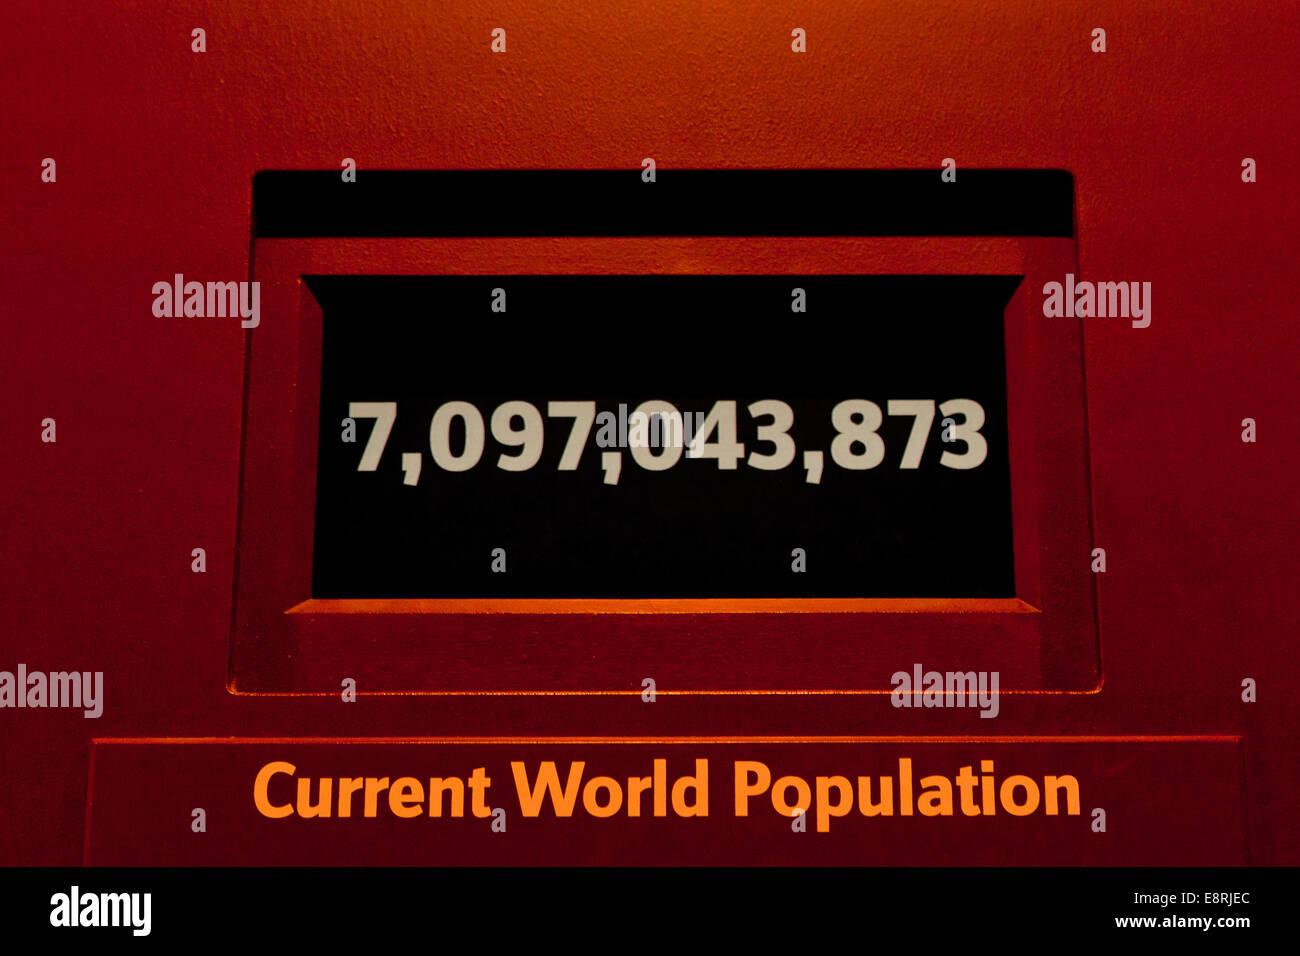 Current world population number display - Stock Image